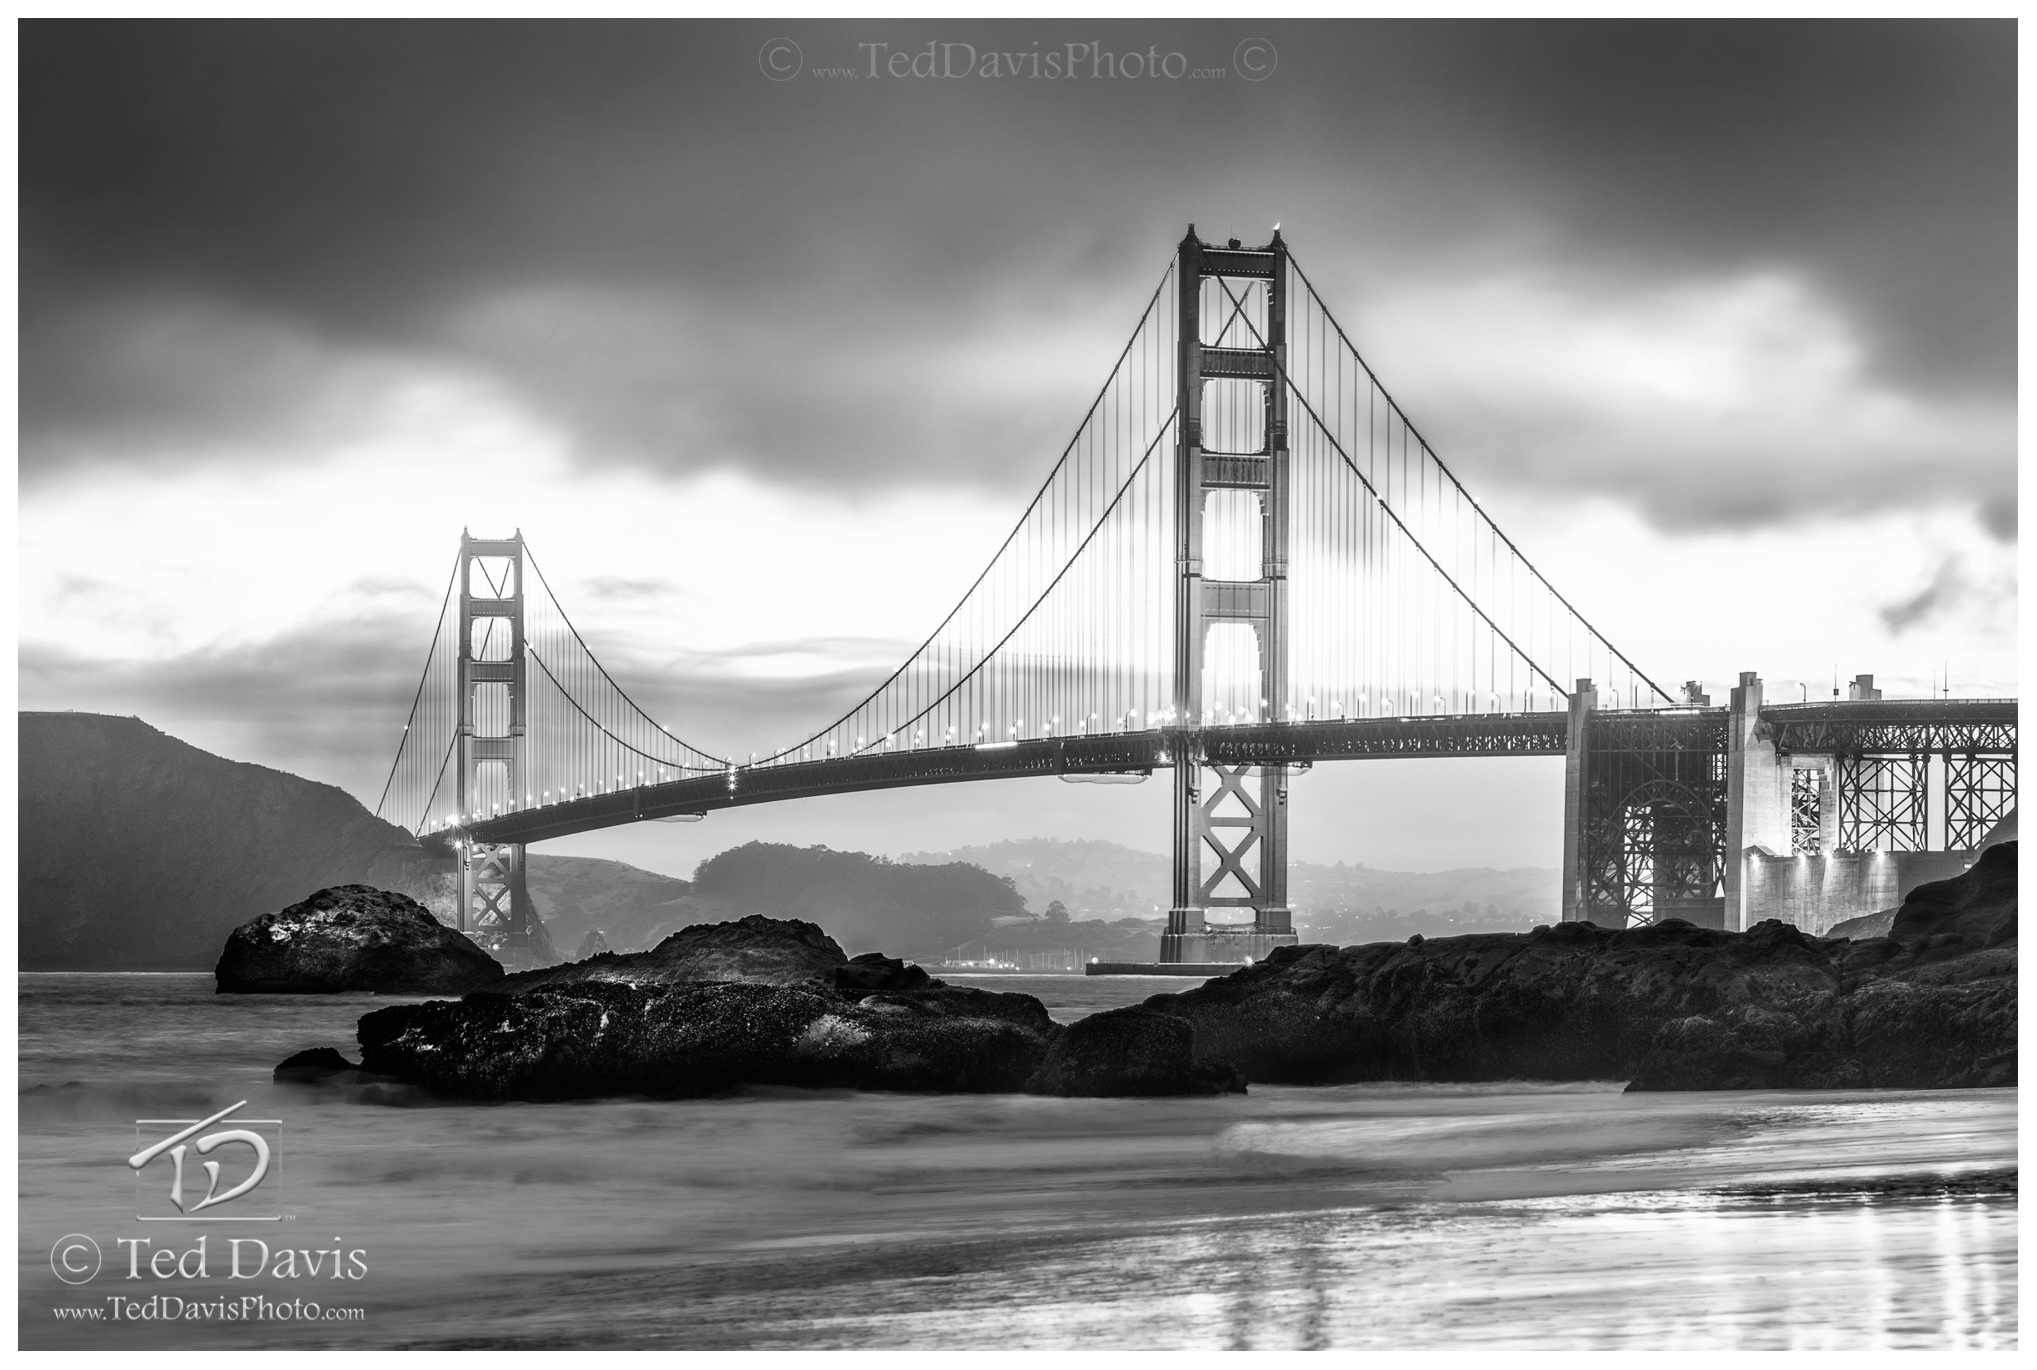 photograph, art, landscape, travel, sunrise, sunset, water, ocean, bridge, sanfran, francisco, golden, gate, black, white, fog, photo